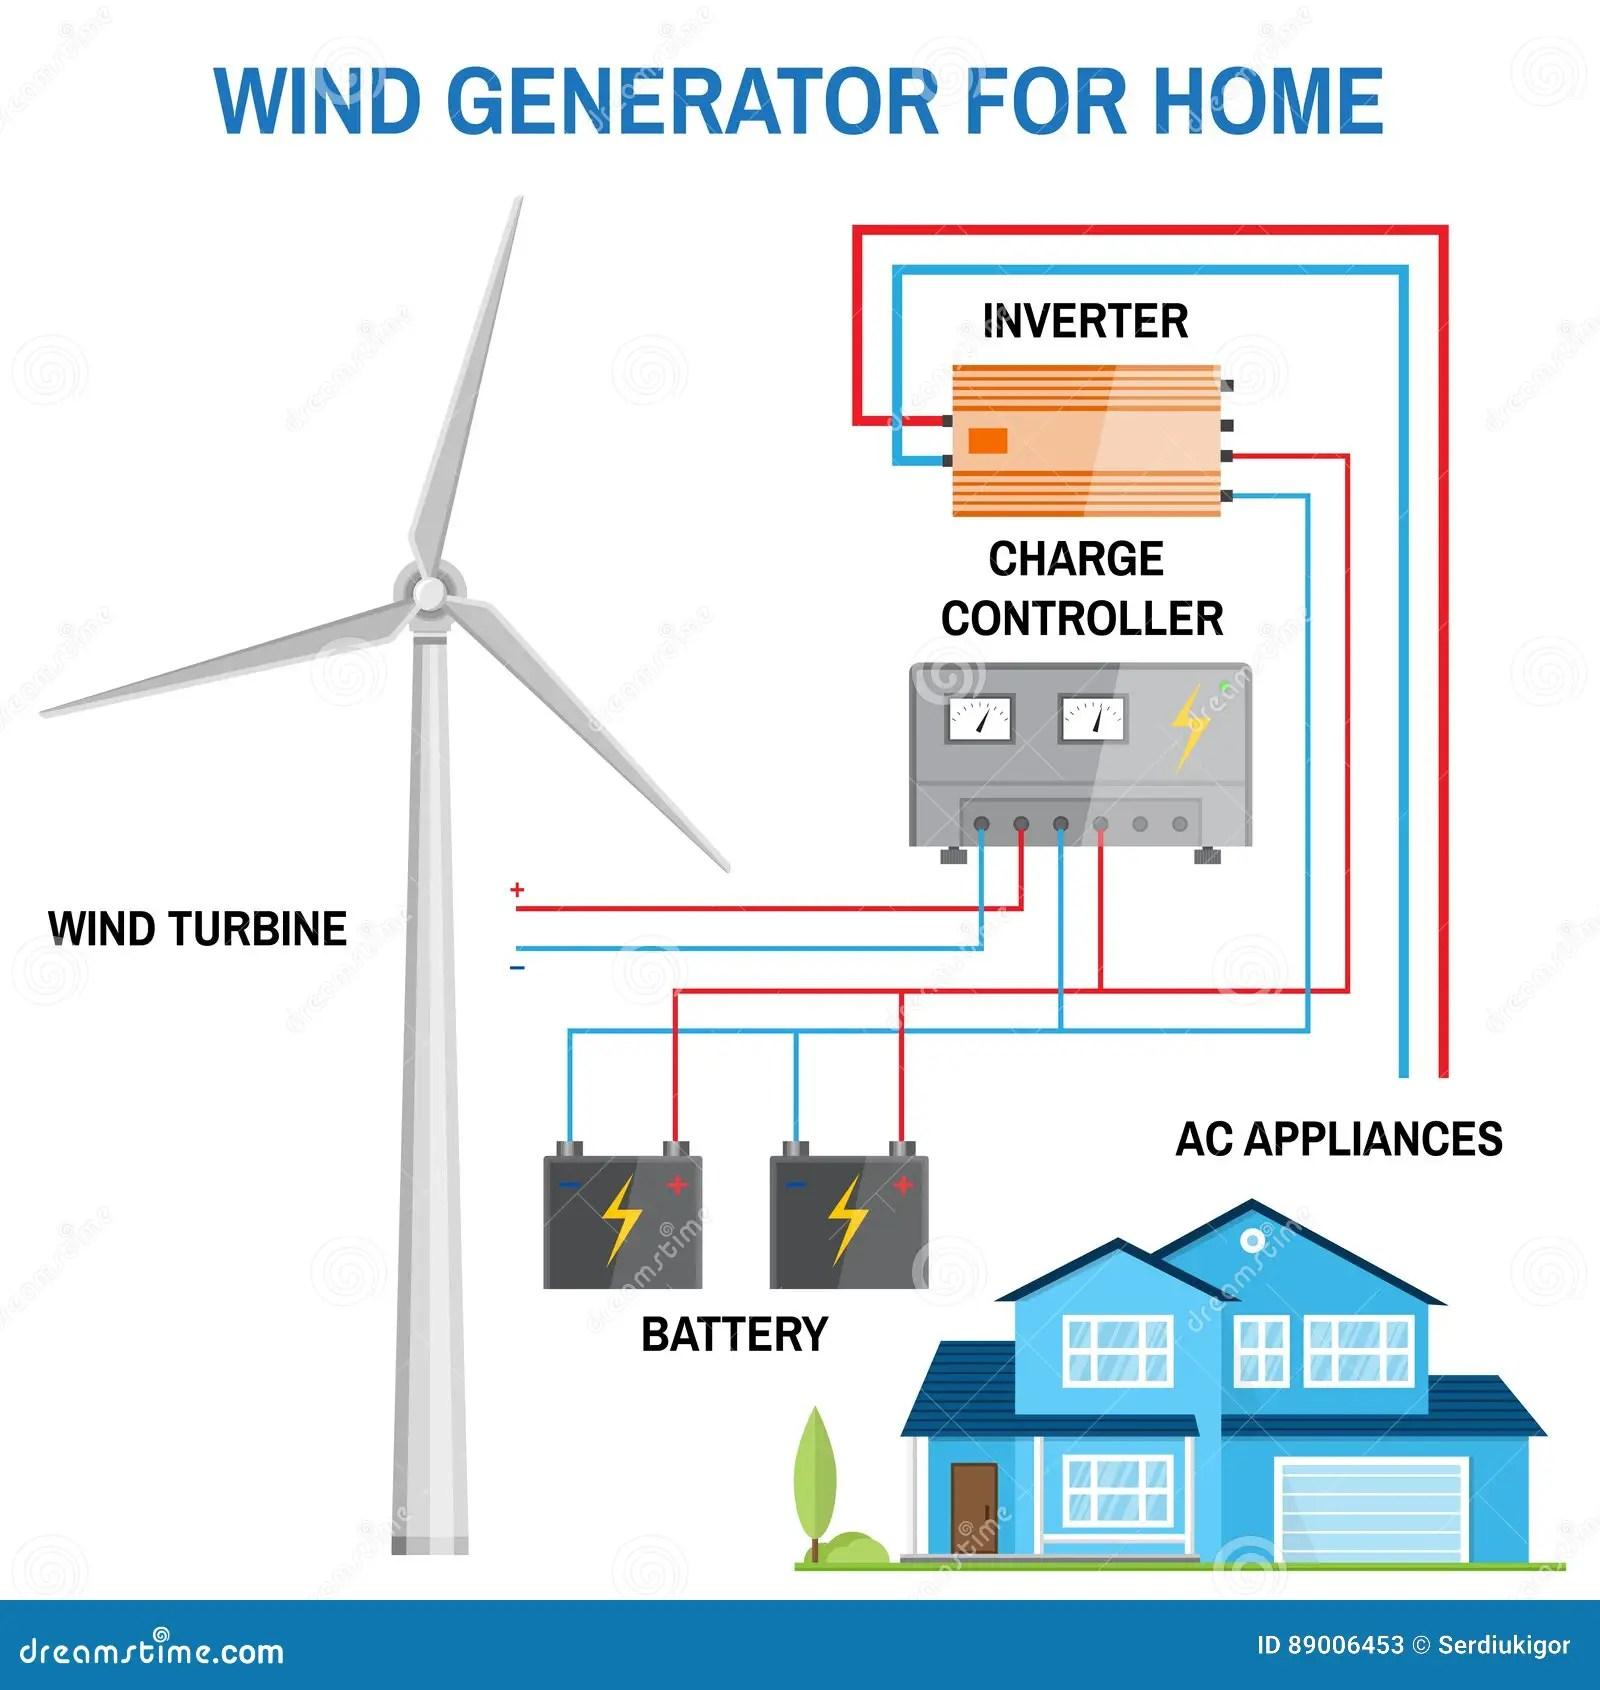 hight resolution of wind generator for home vector stock vector illustration of diagram of wind turbine generator